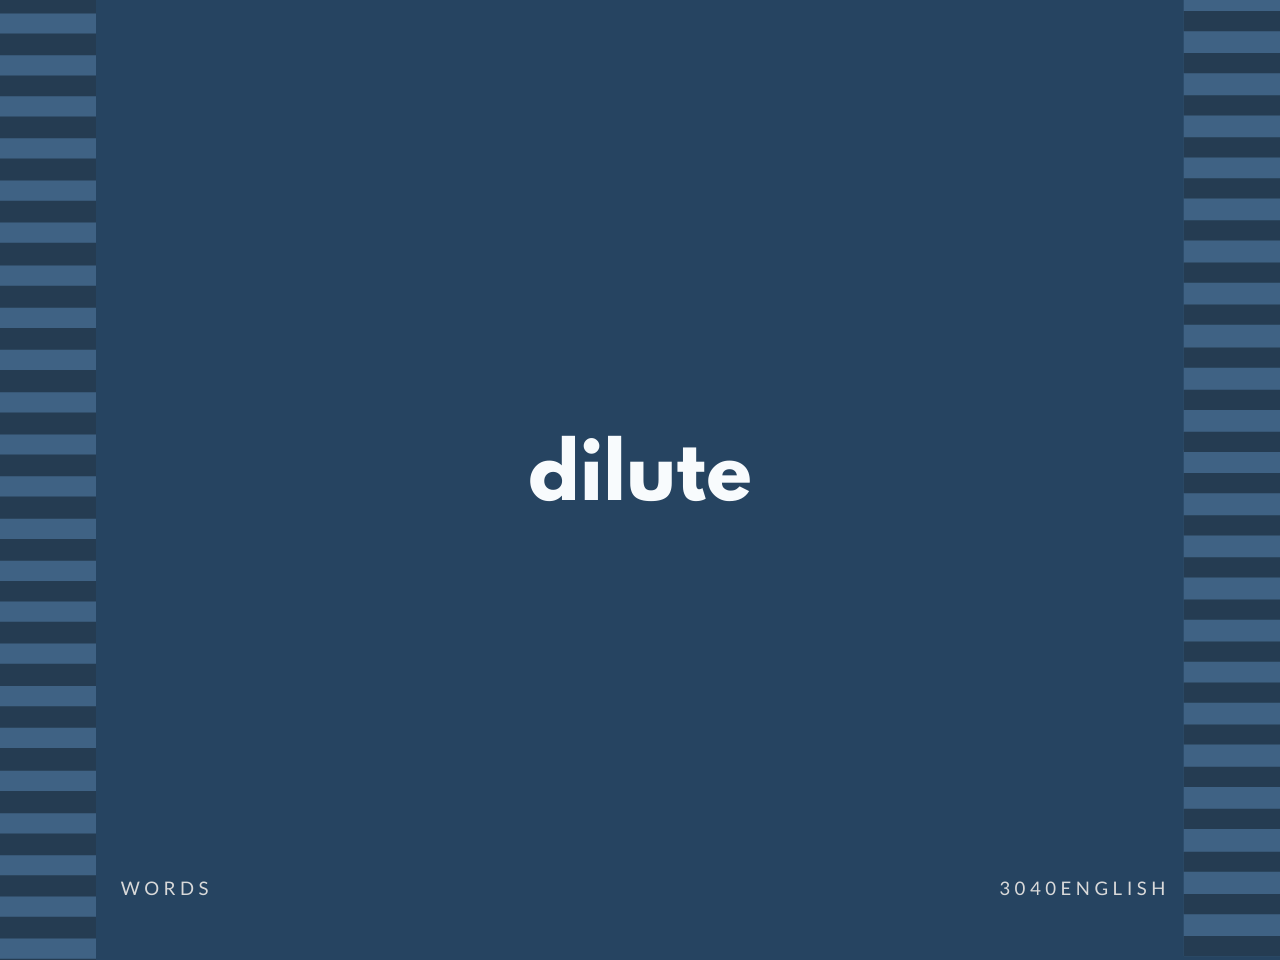 dilute の意味と簡単な使い方【音読用例文あり】